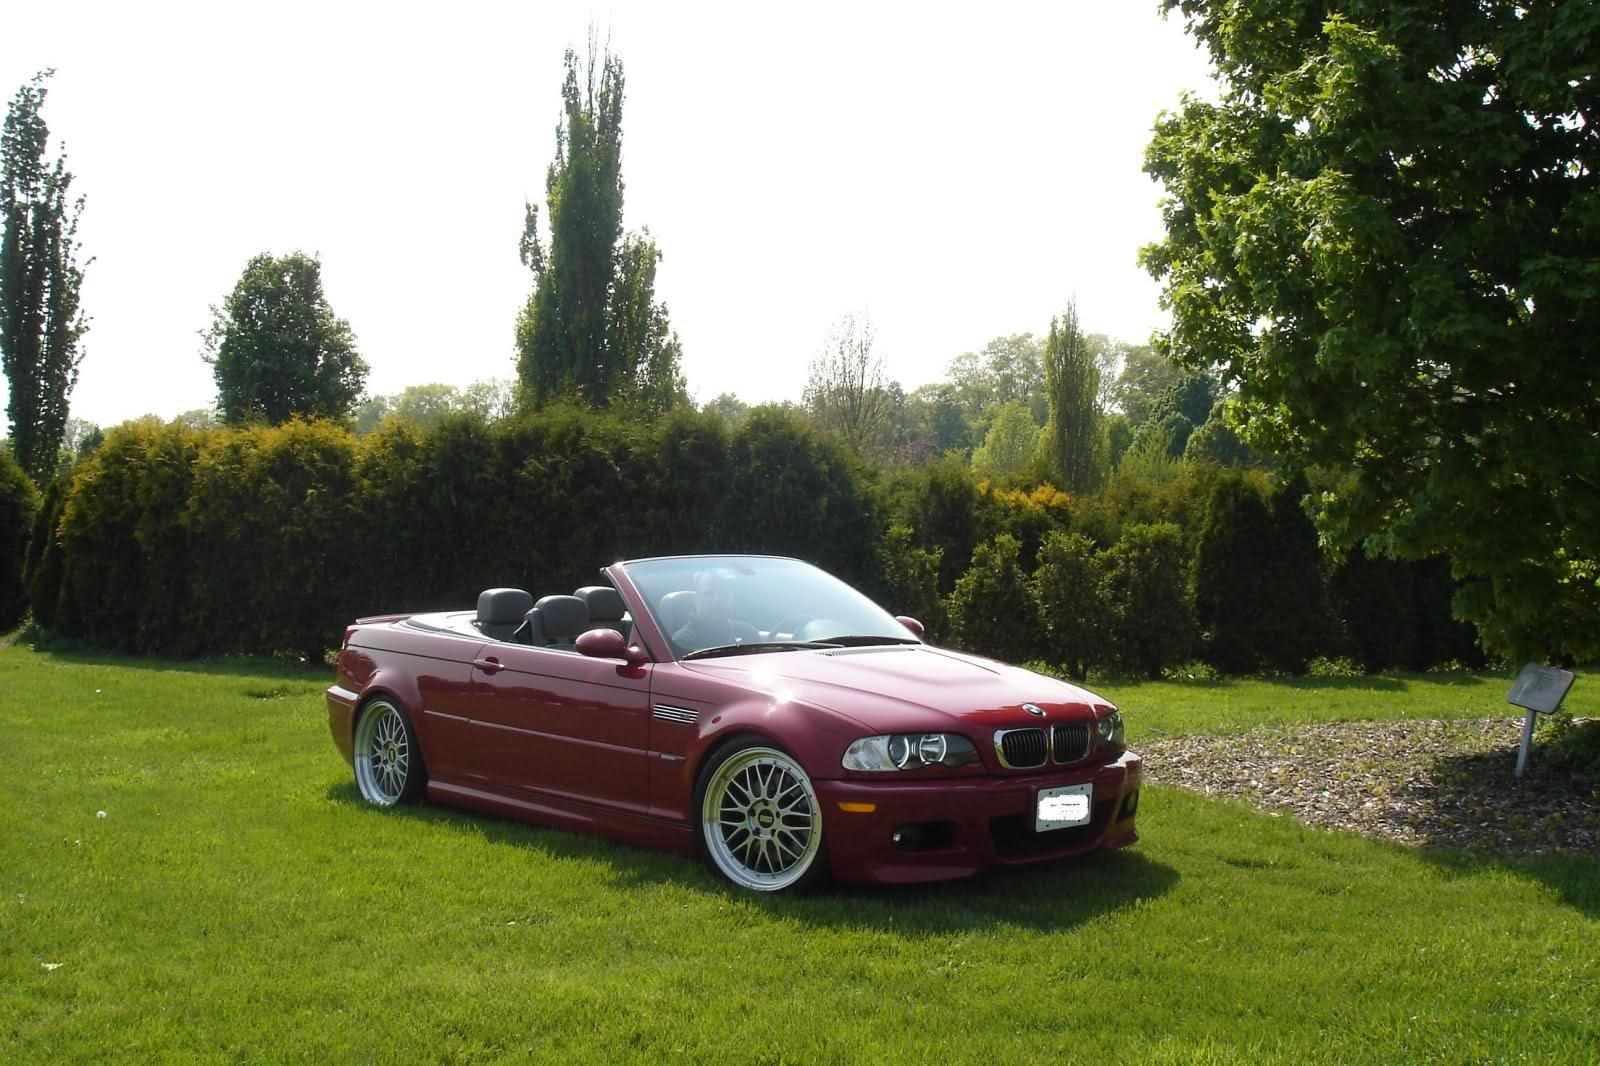 2001_BMW_e_46_convertible_1600x1066.jpg